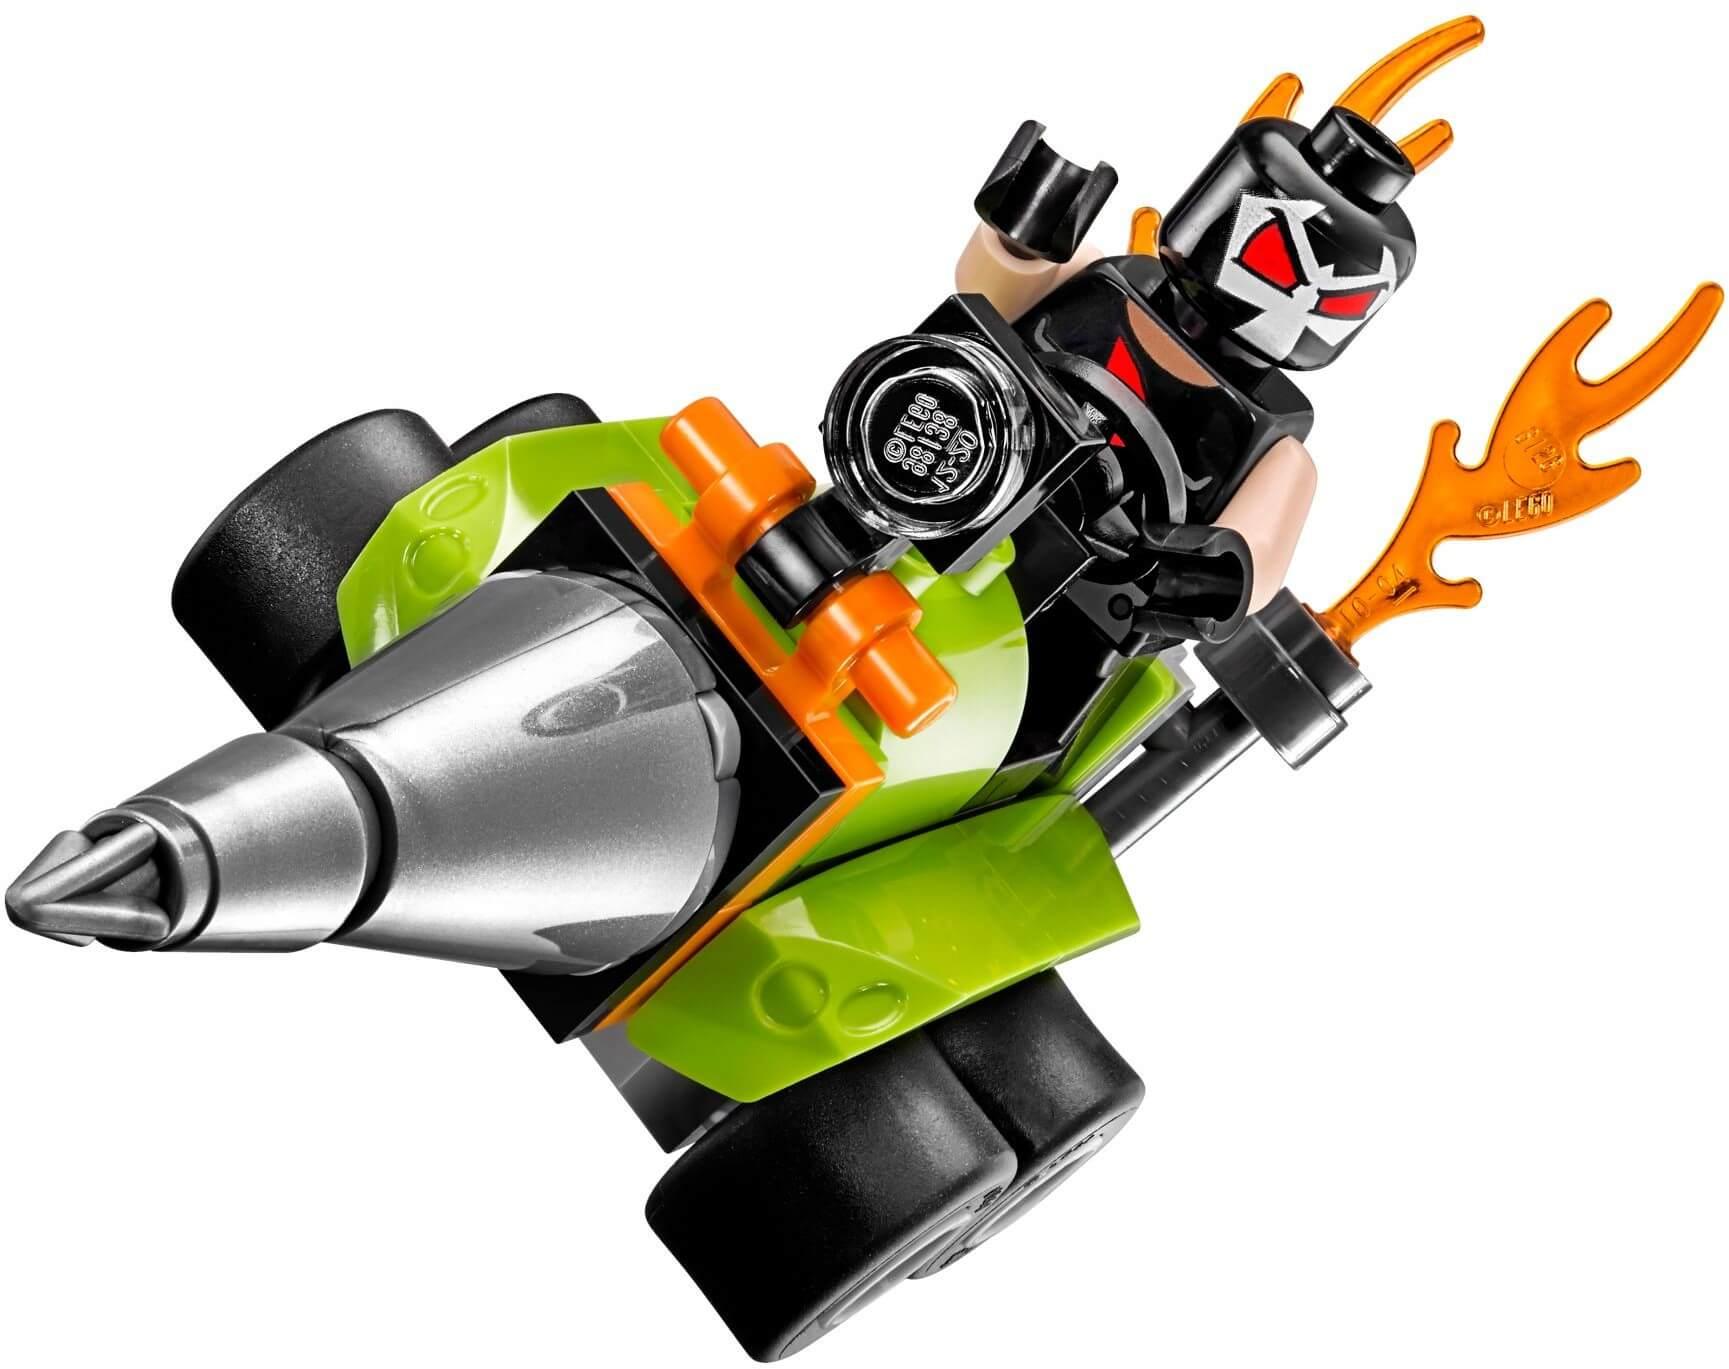 Mua đồ chơi LEGO 76062 - LEGO DC Comics Super Heroes 76062 - Robin đại chiến Bane (LEGO DC Comics Super Heroes Mighty Micros: Robin vs. Bane 76062)